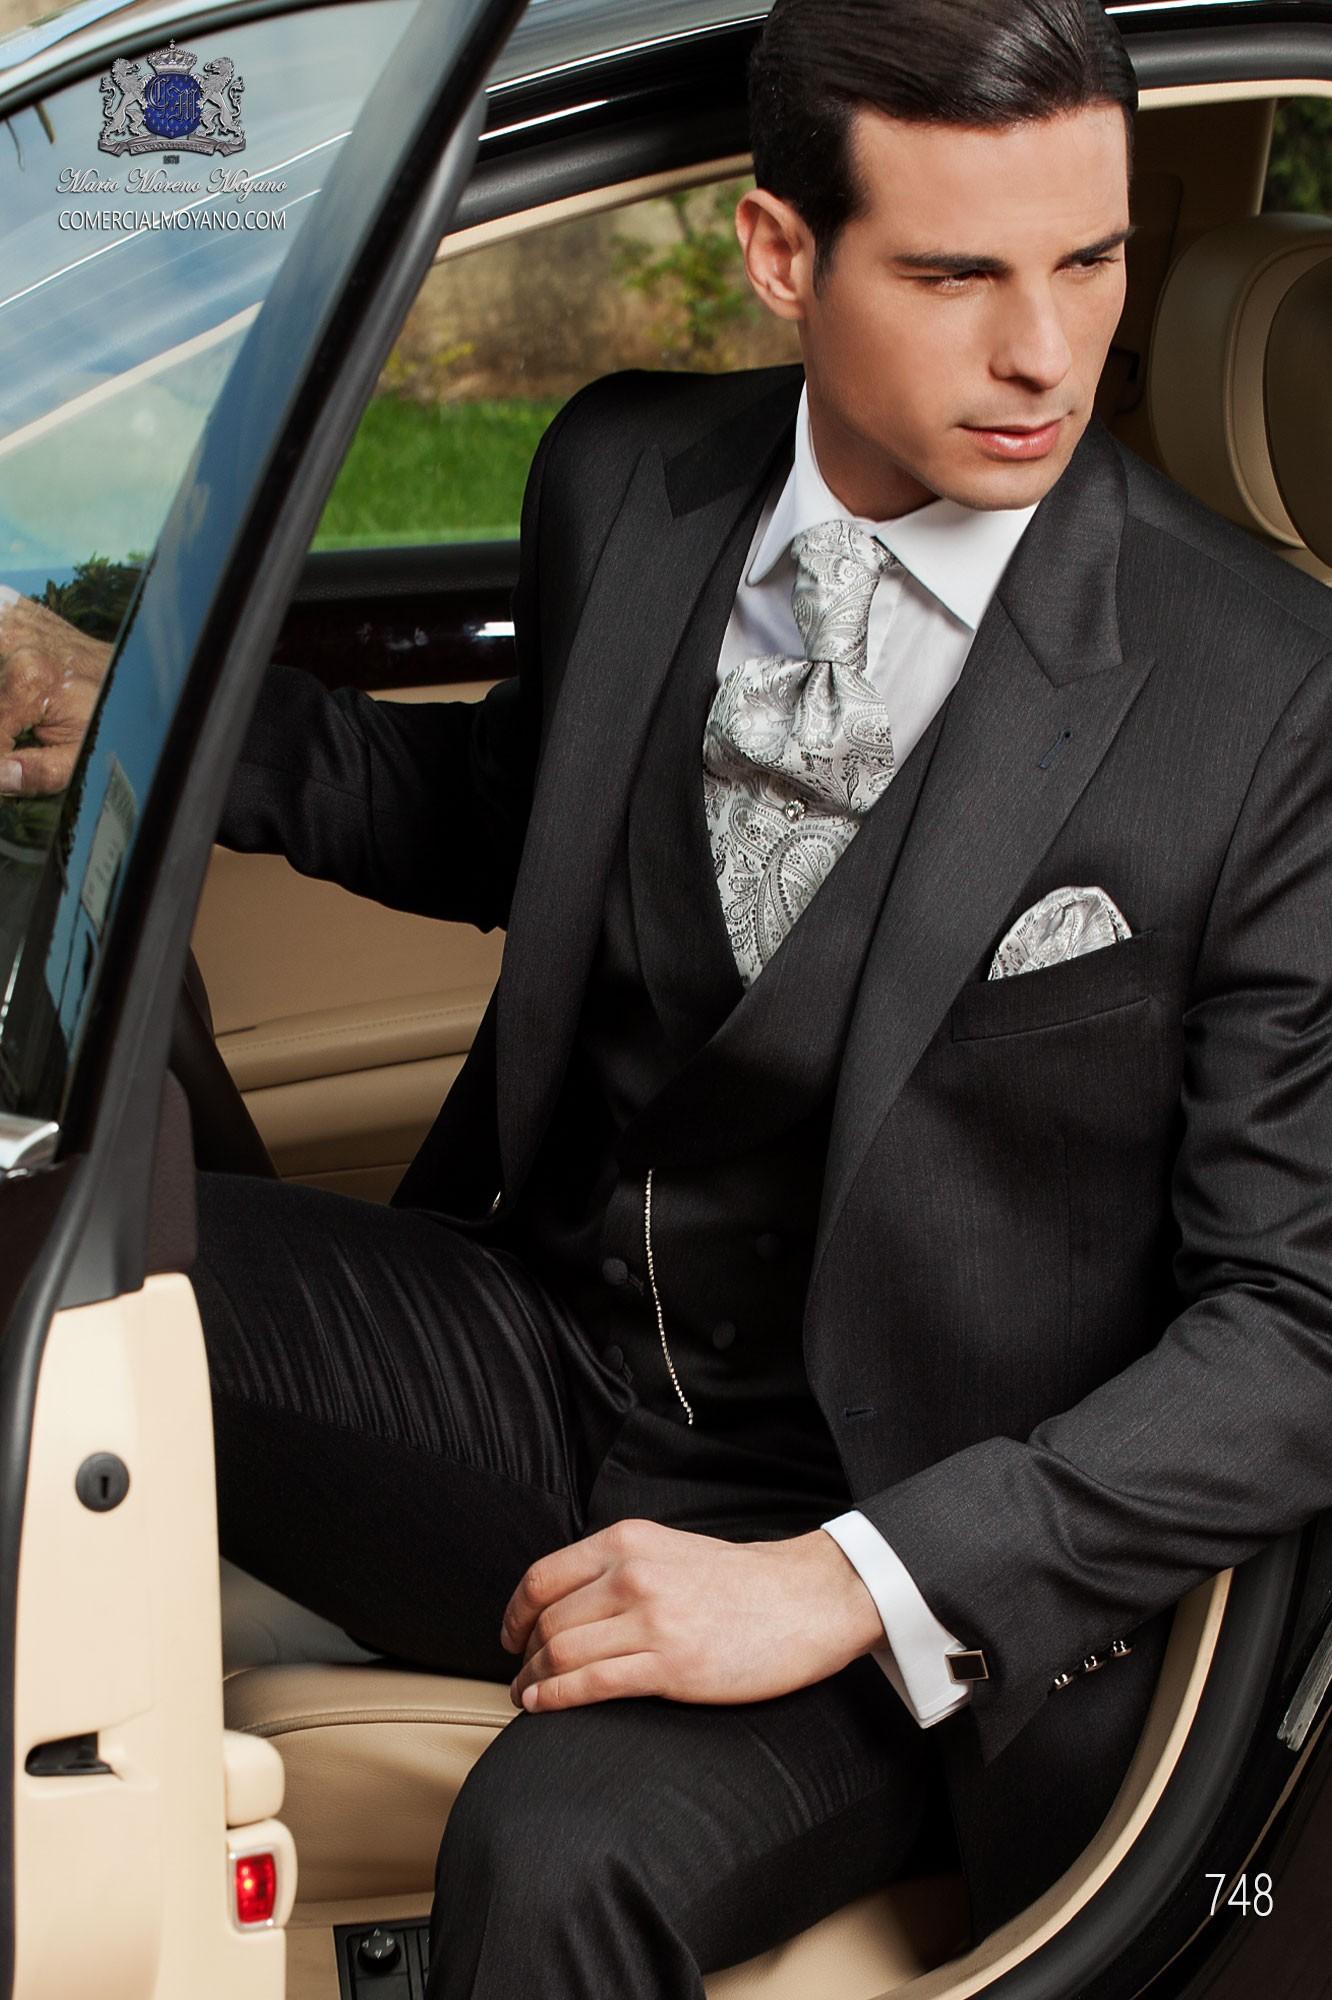 Traje de novio moderno gris modelo: 748 Ottavio Nuccio Gala colección Fashion